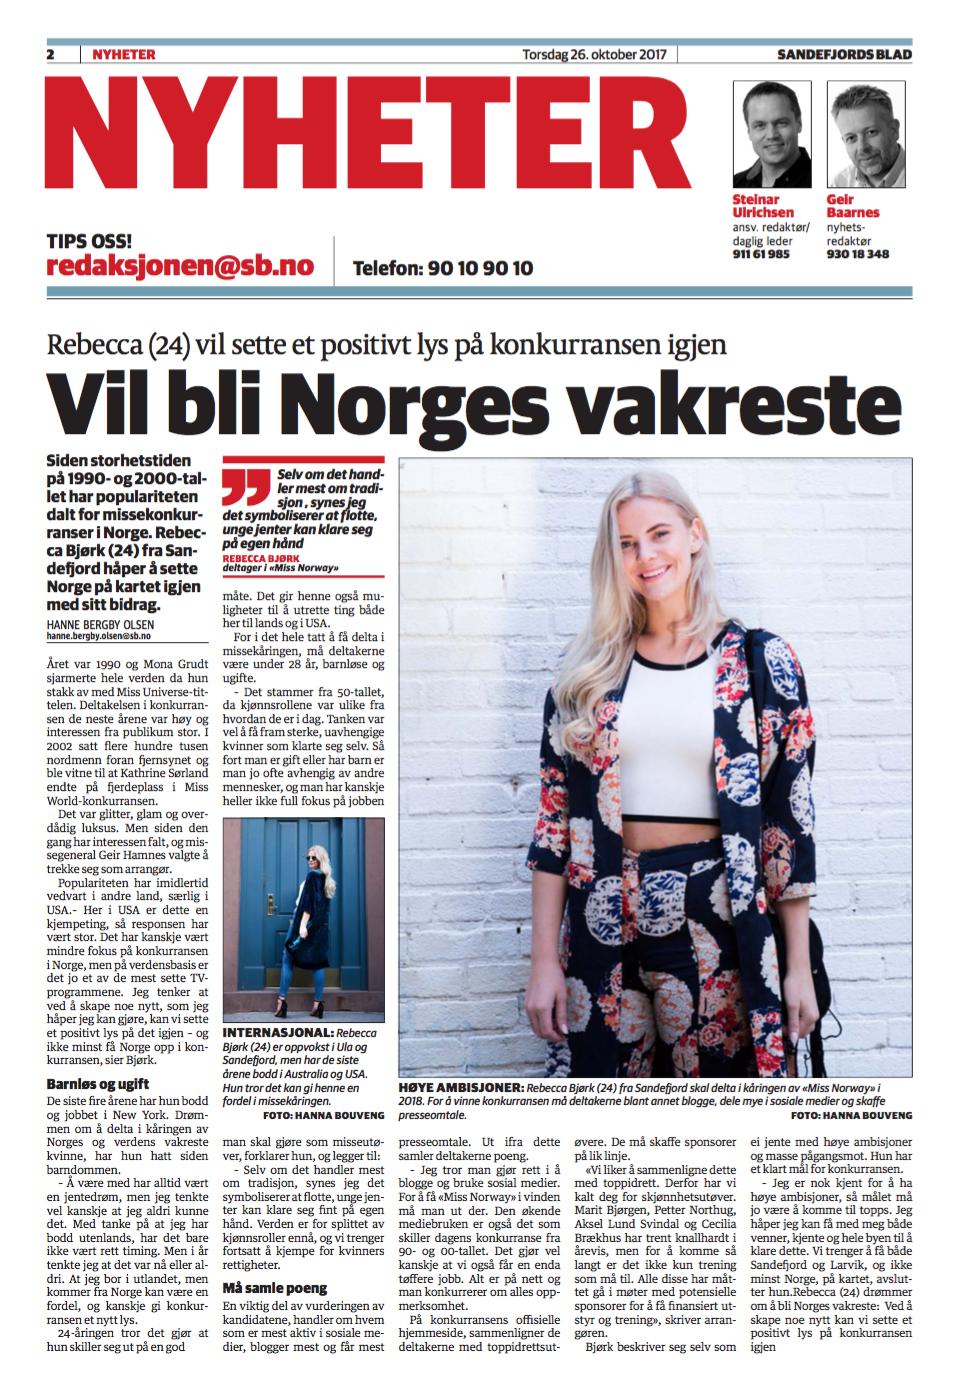 Rebecca Bjørk,  Kandidat Miss Norway